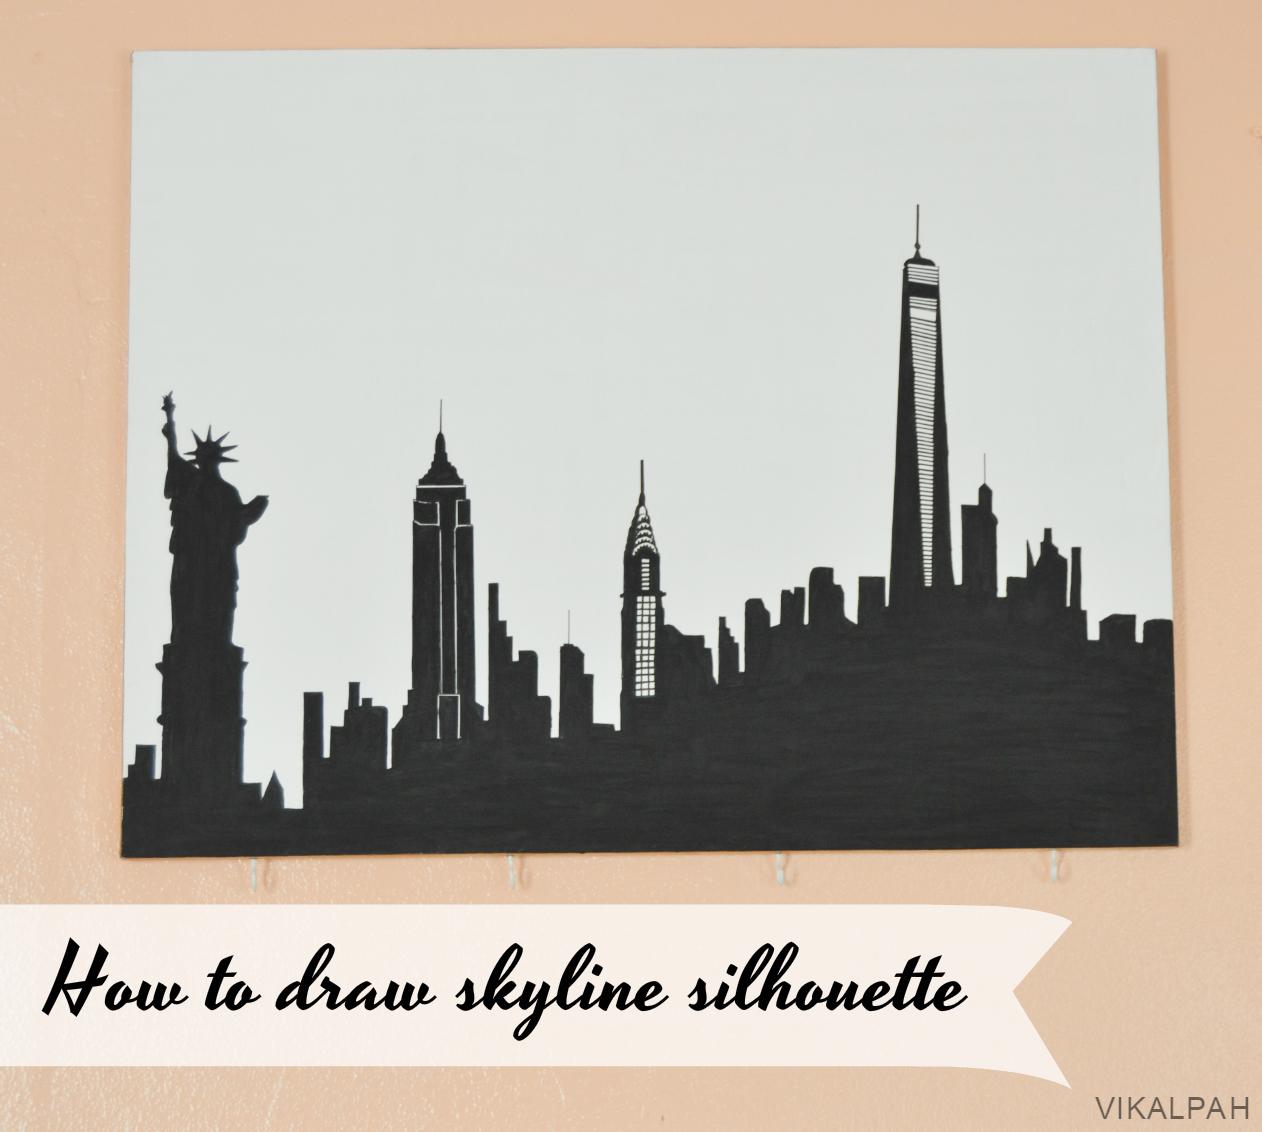 1262x1132 Vikalpah How To Draw Skyline Silhouette + Ny Gallery Wall